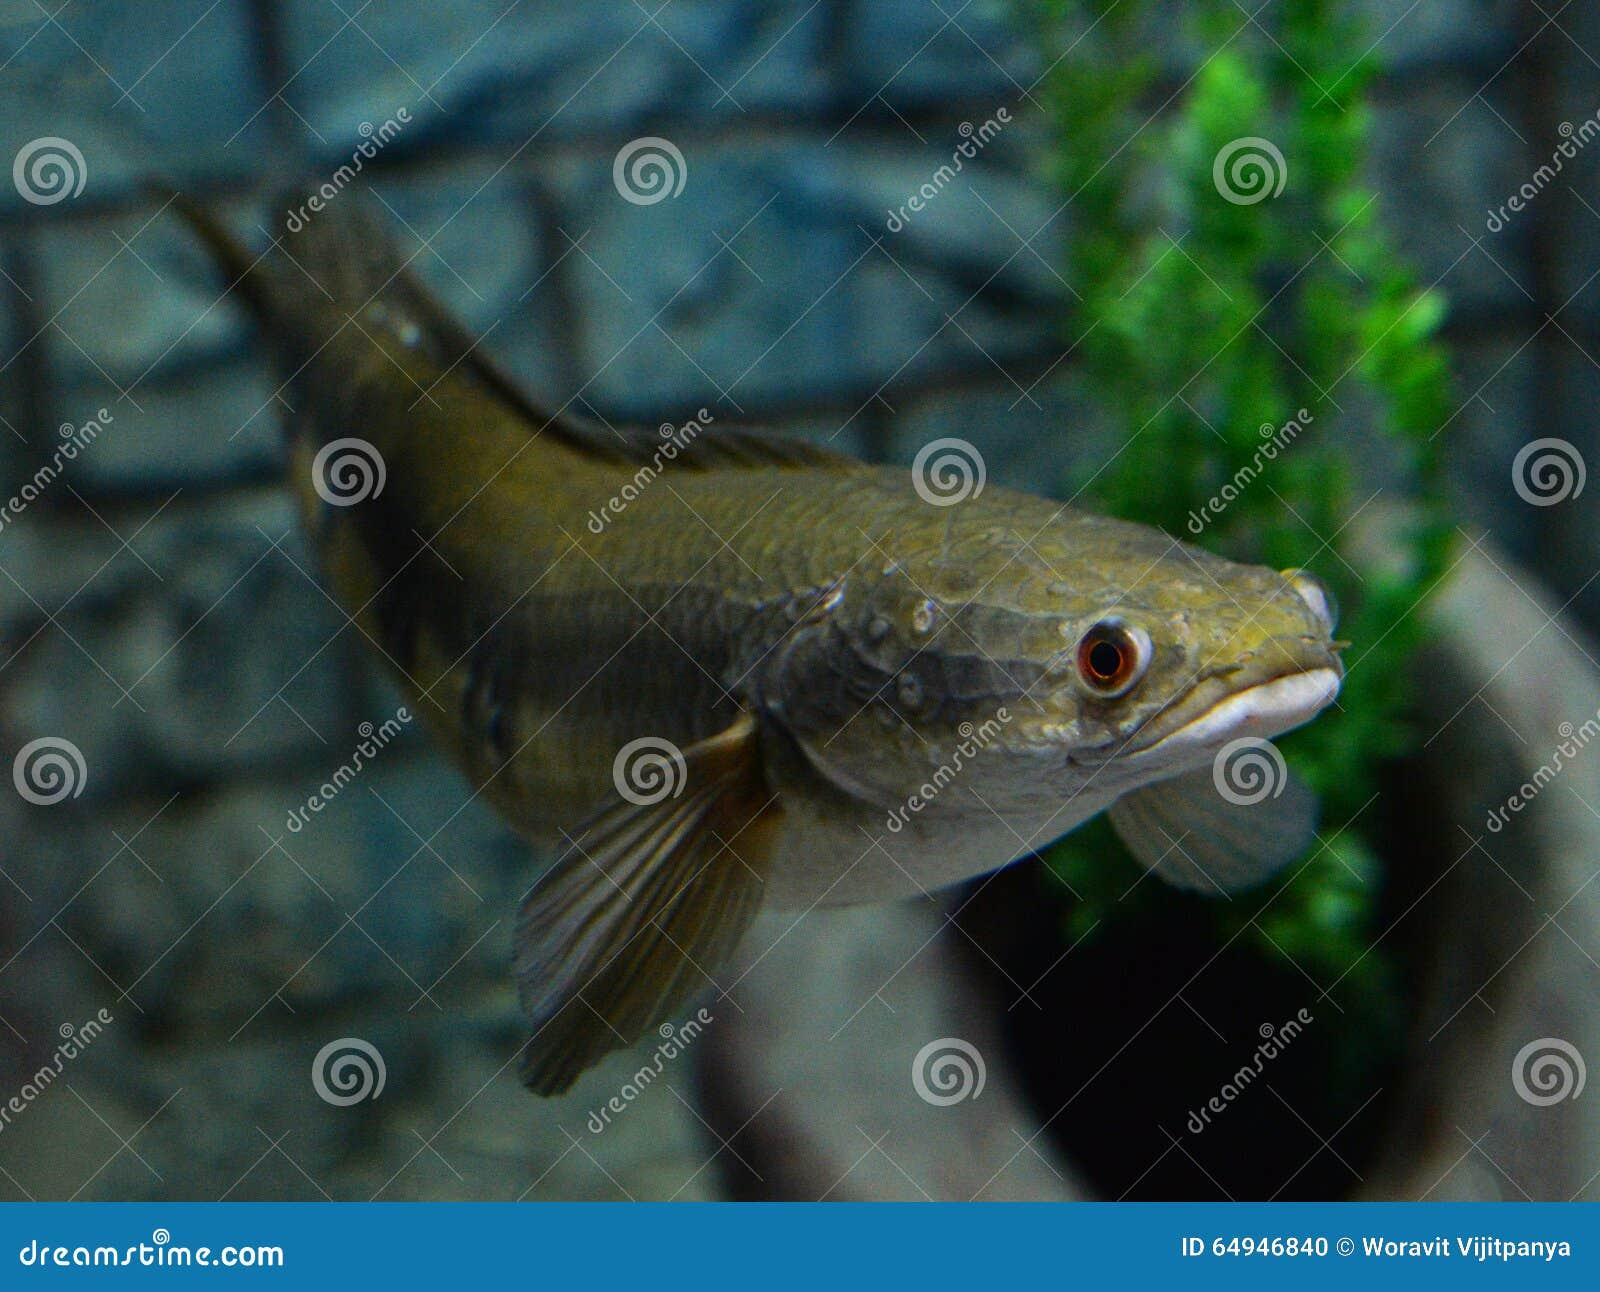 Emperor Snake Head Fish Stock Photo Image Of Design 64946840